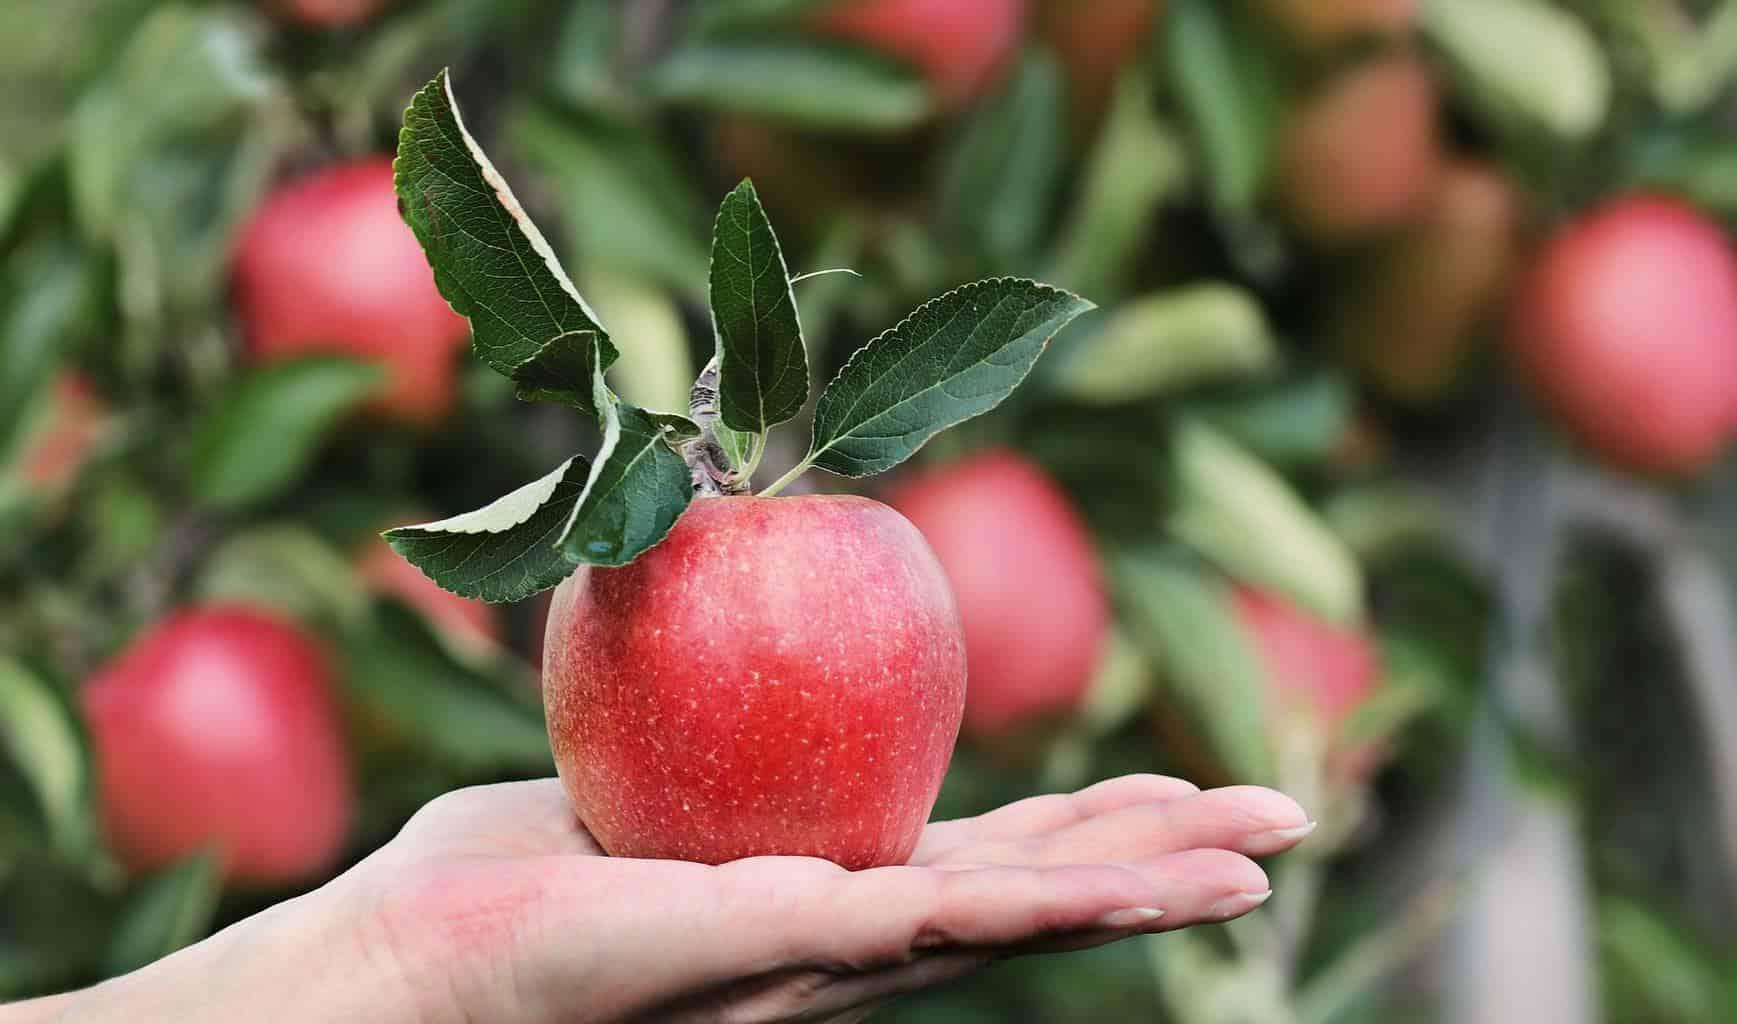 A juicy delicious red apple